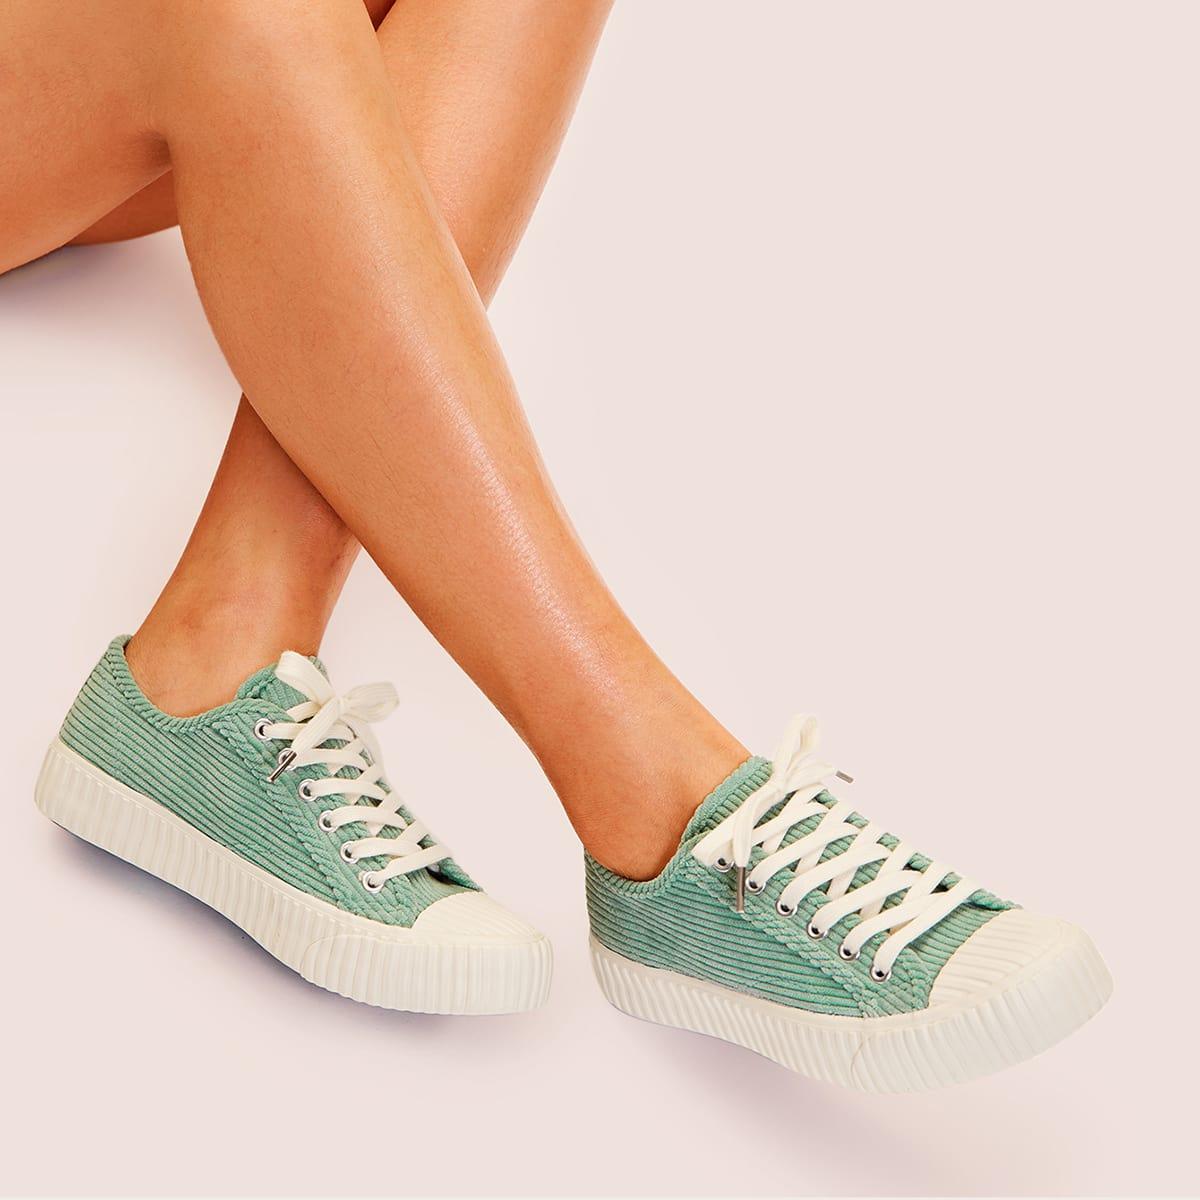 Groen Comfortabel sneakers Kant